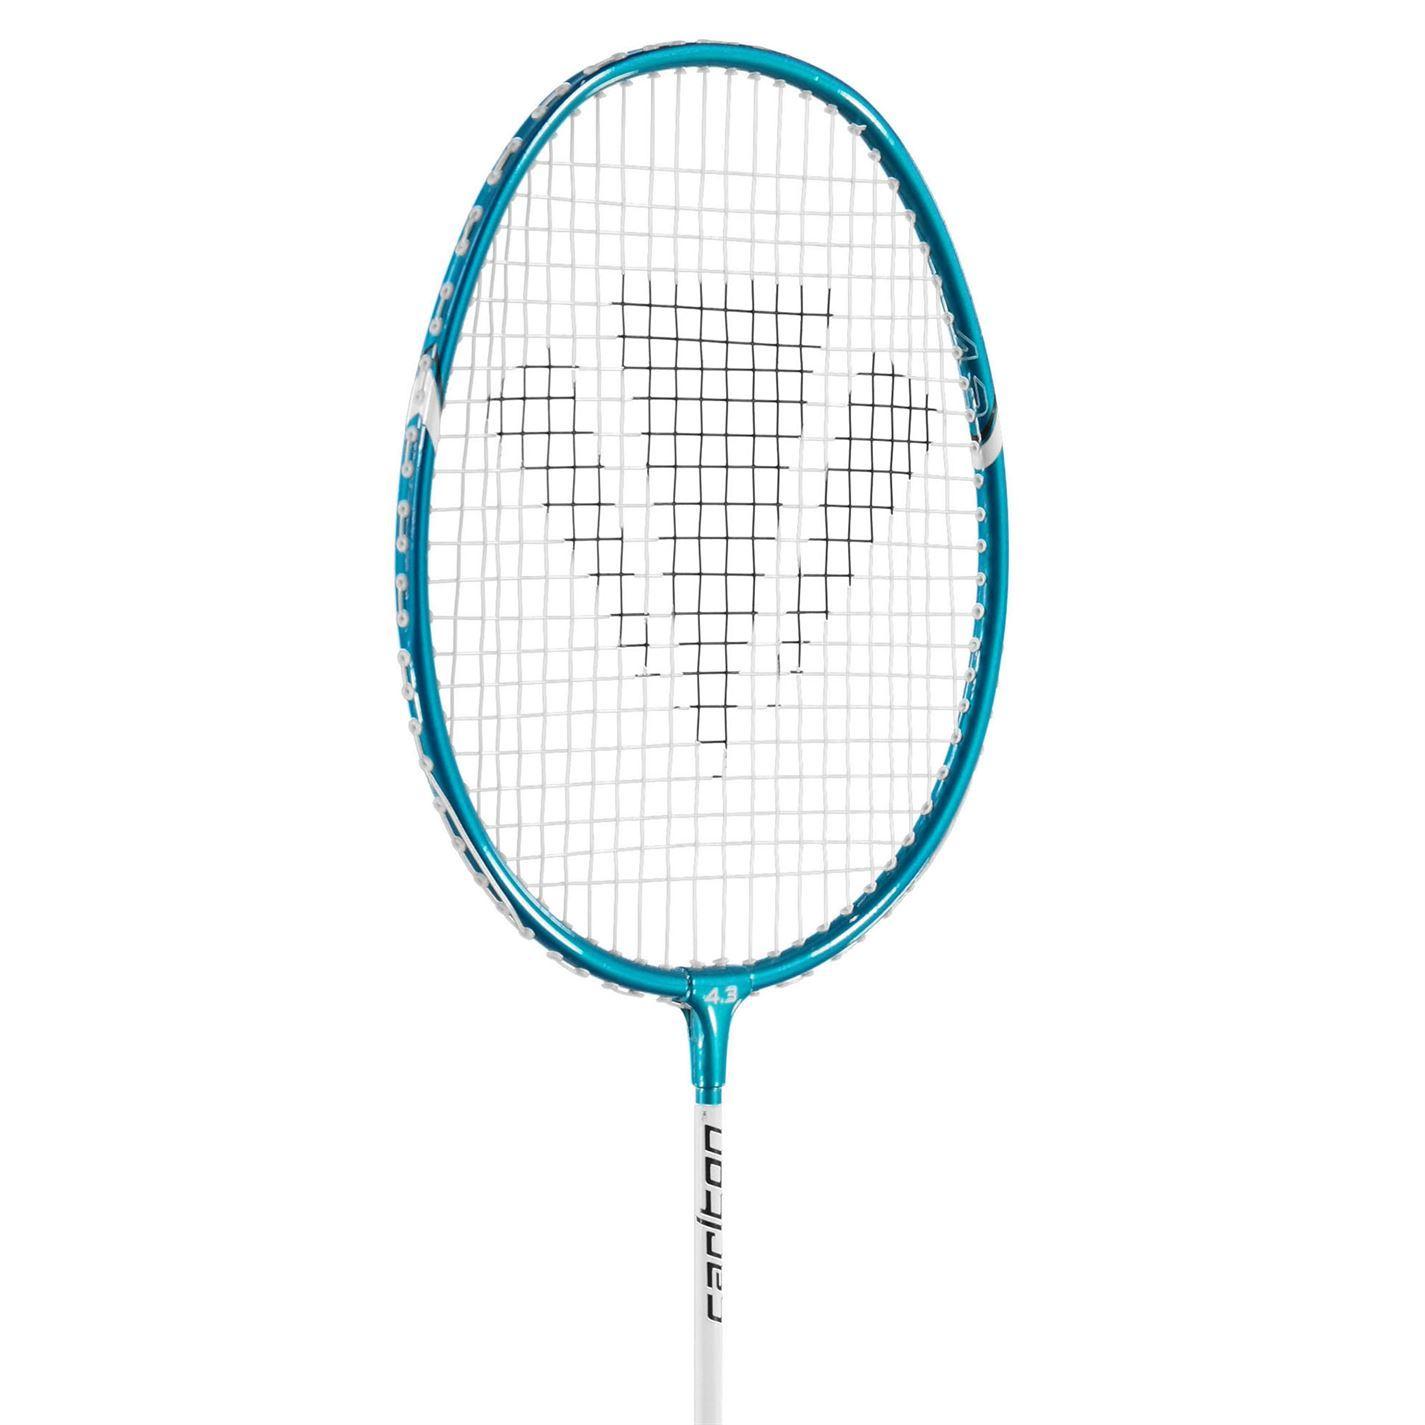 Carlton Unisex Maxi Blade Iso 4 3 Badminton Racket Lightweight Sport